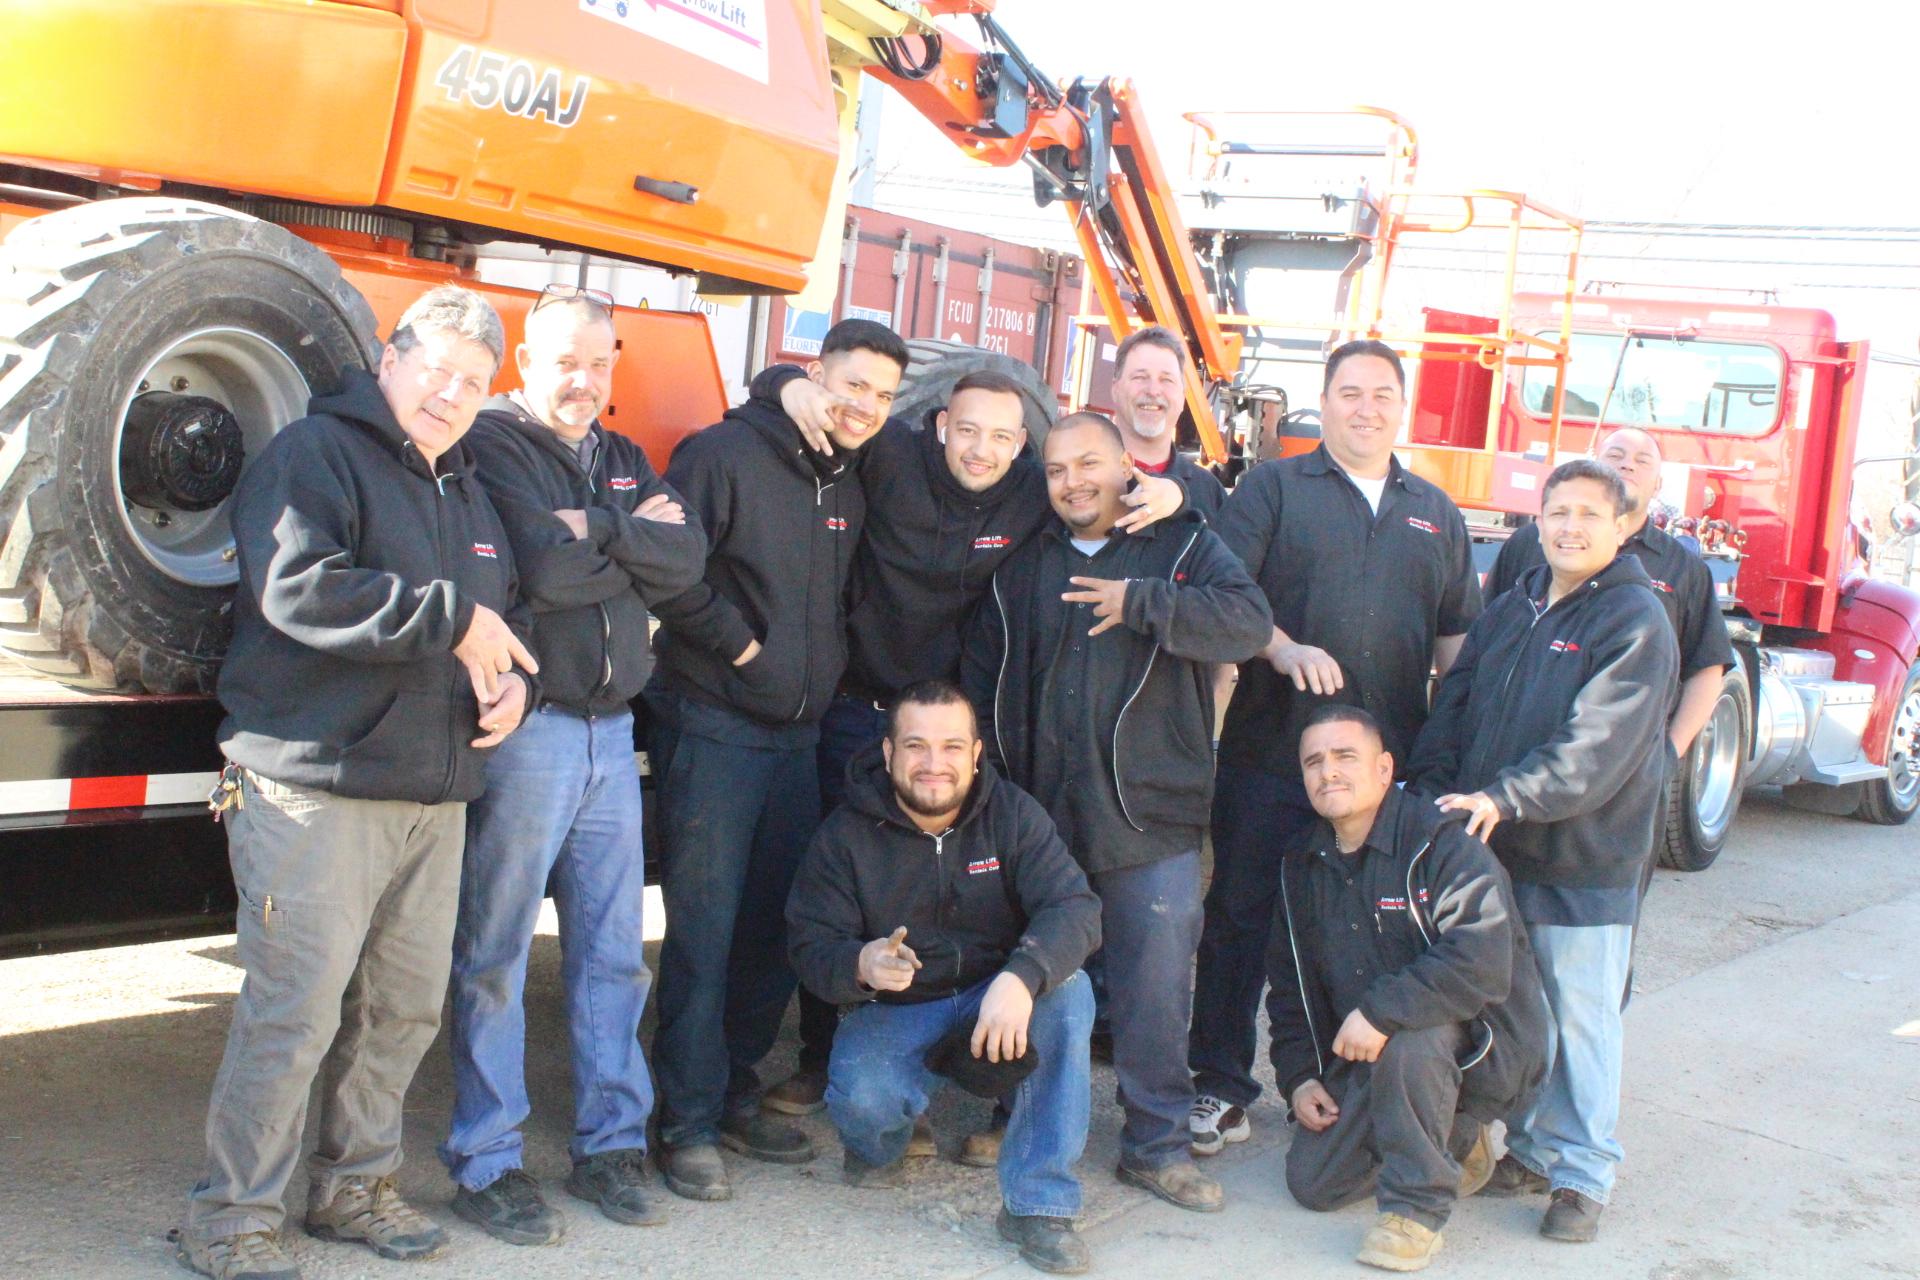 The whole crew